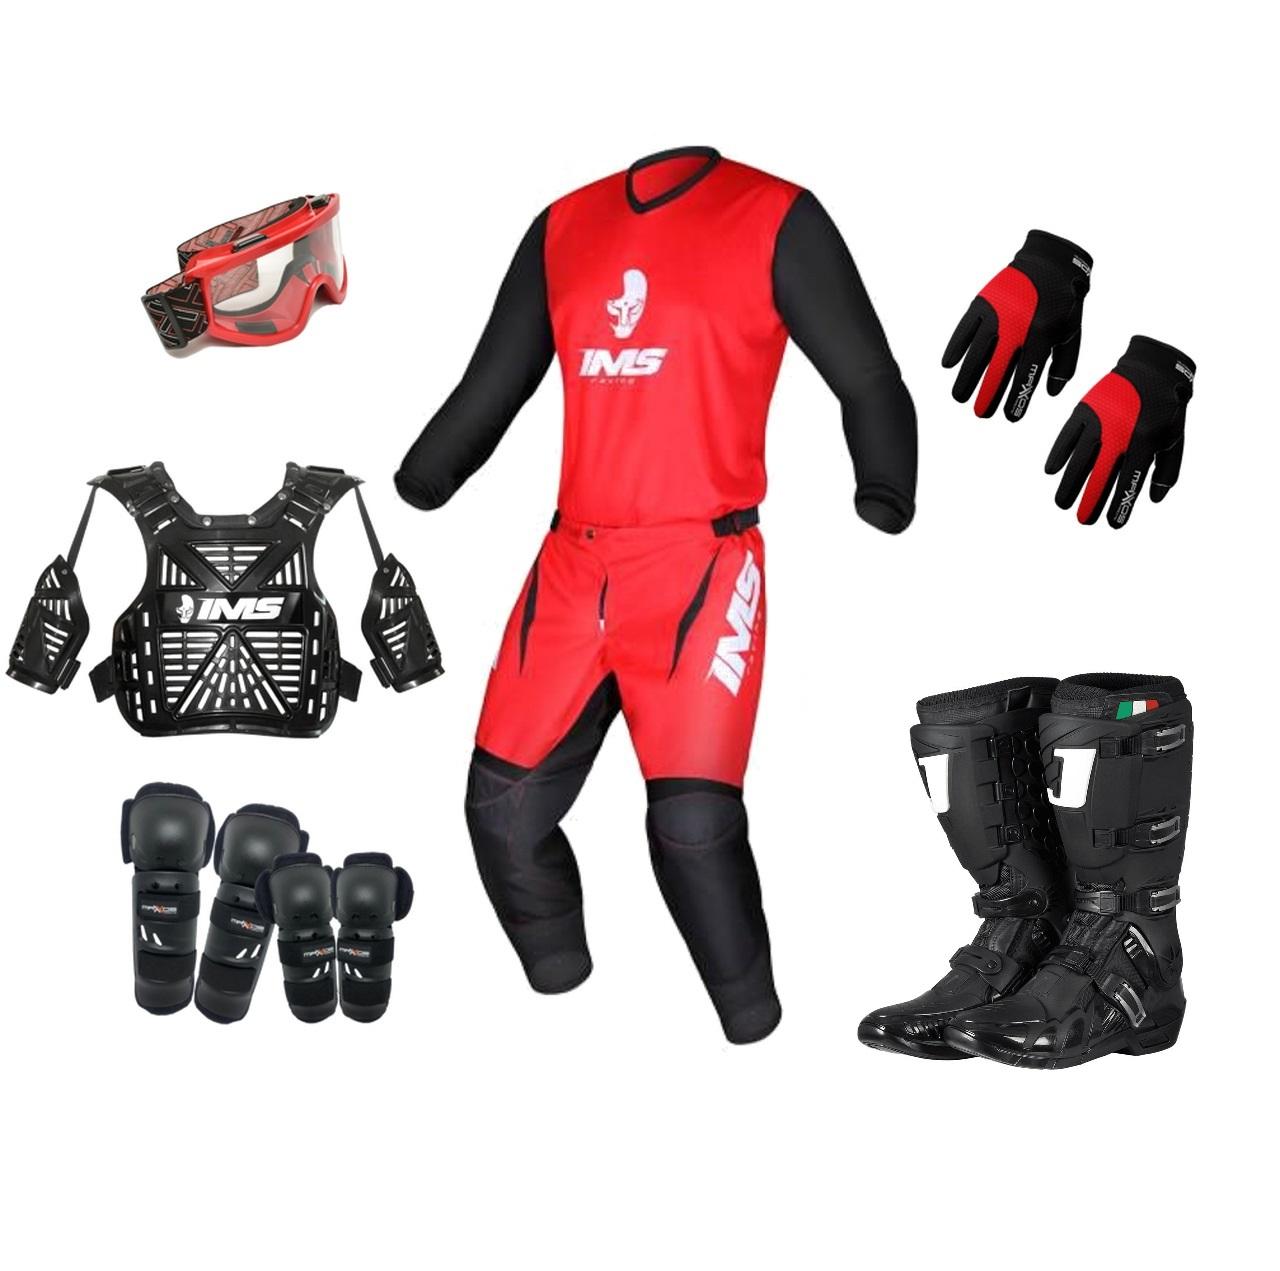 Kit Equipamento Trilha Motocross Enduro Basic - Vermelho